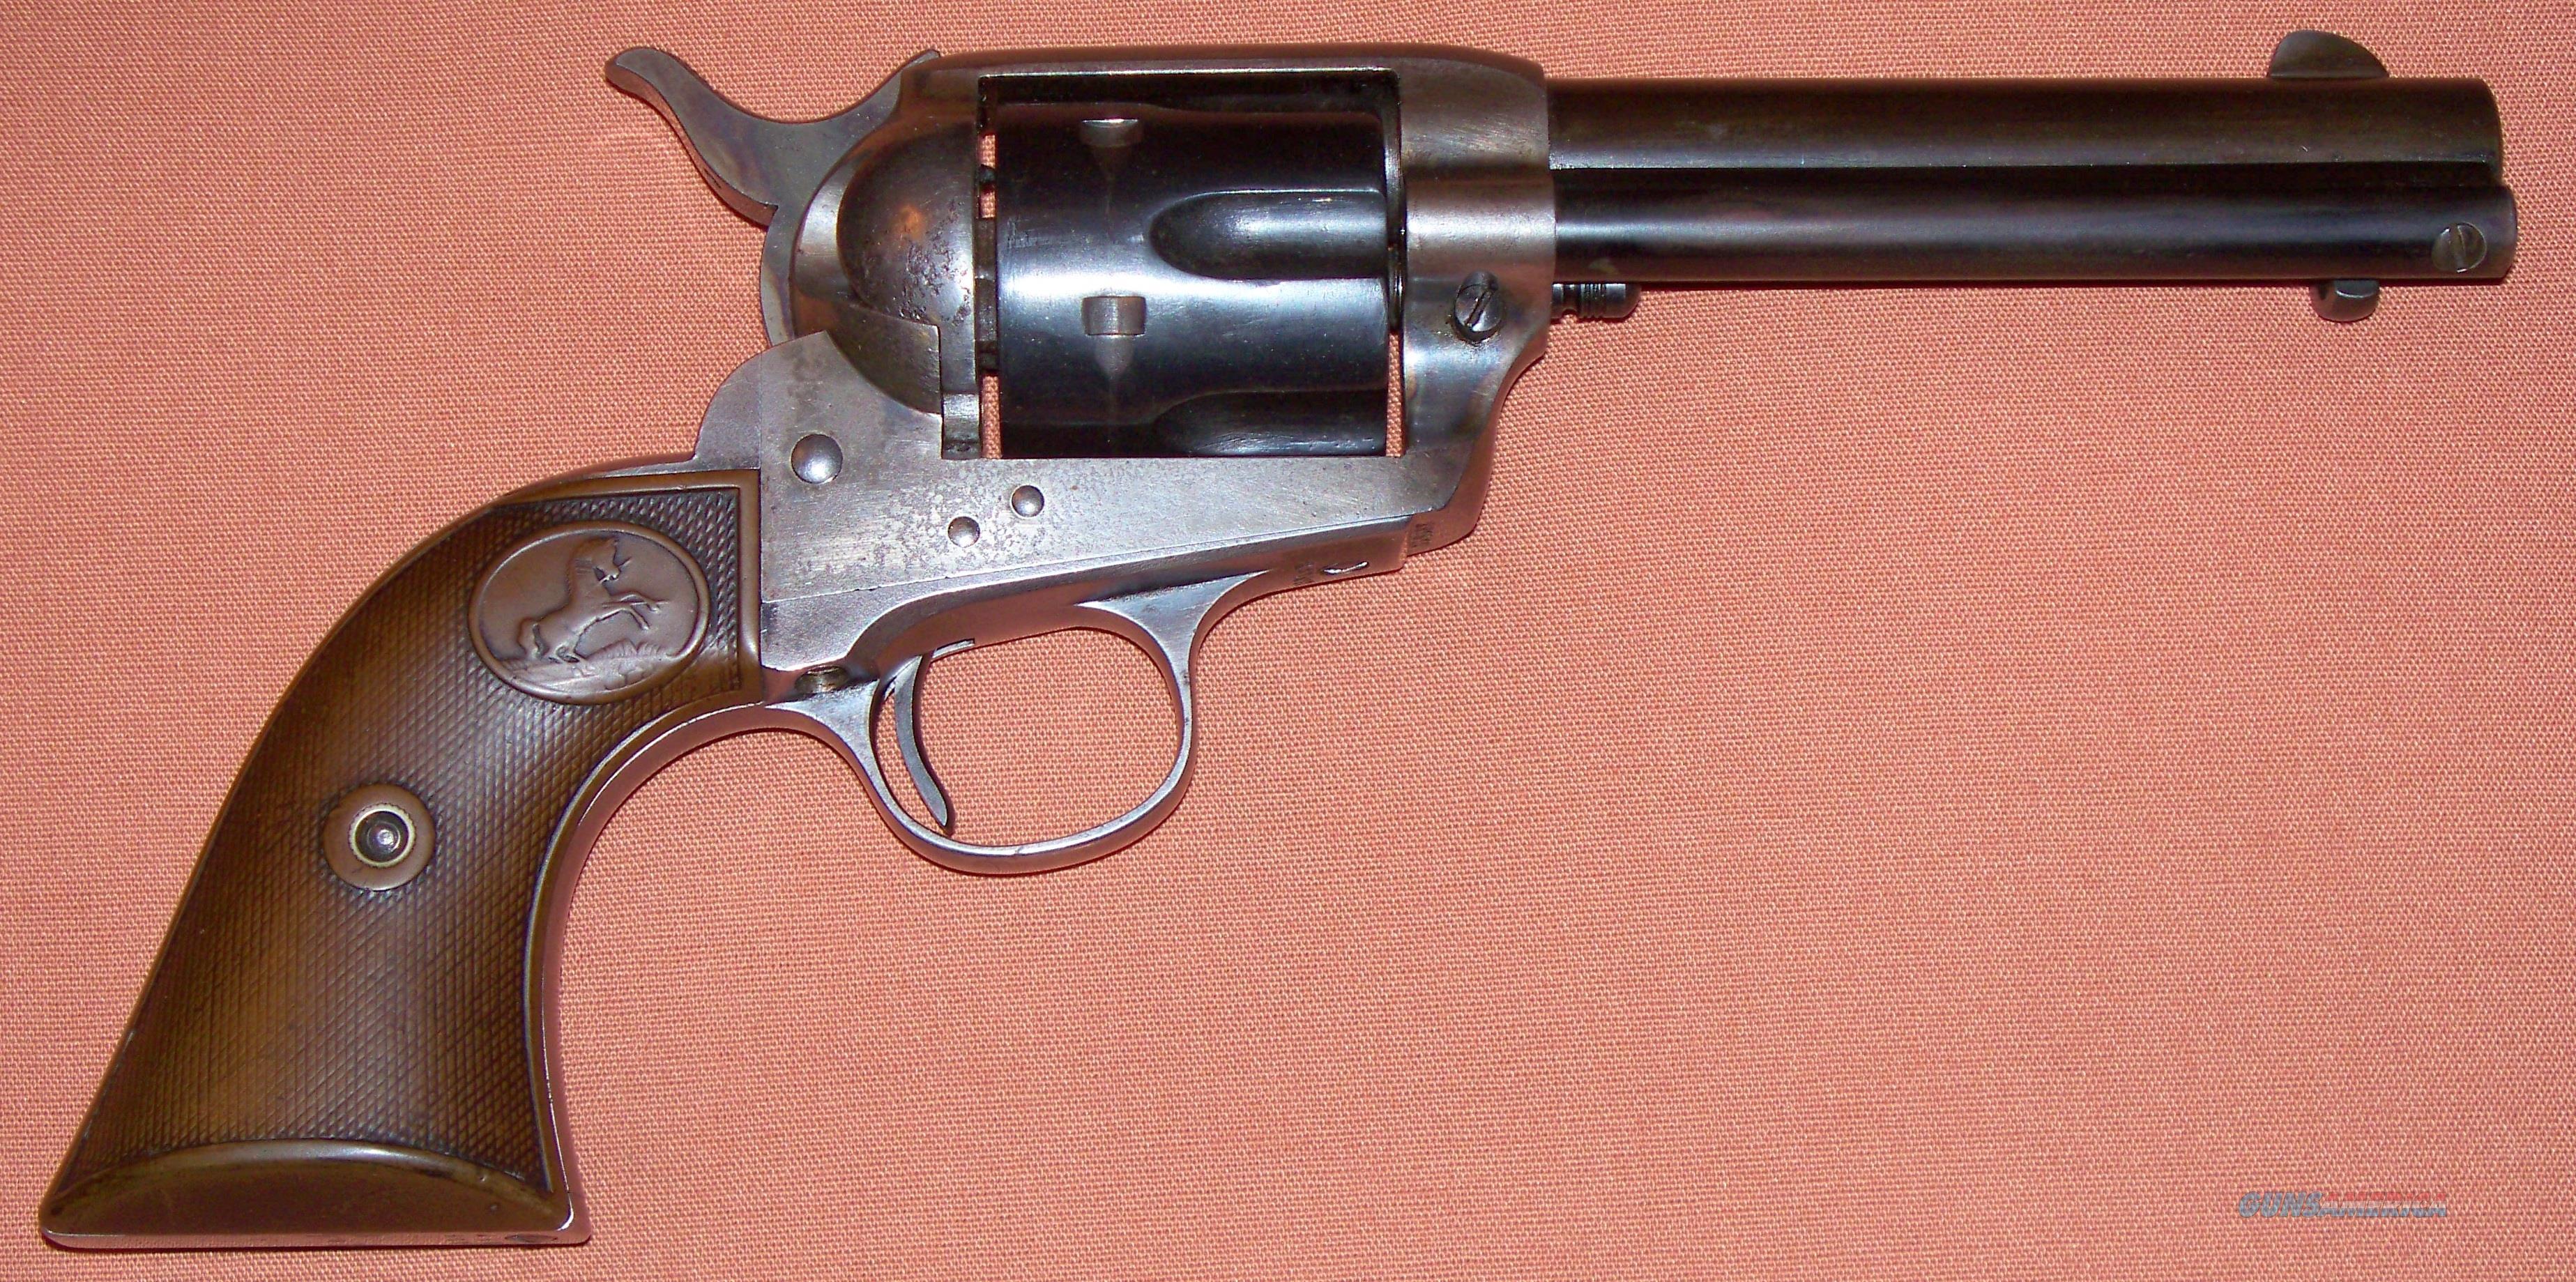 Test: Umarex Colt Single Action Army 45 Airgun | blogger.com